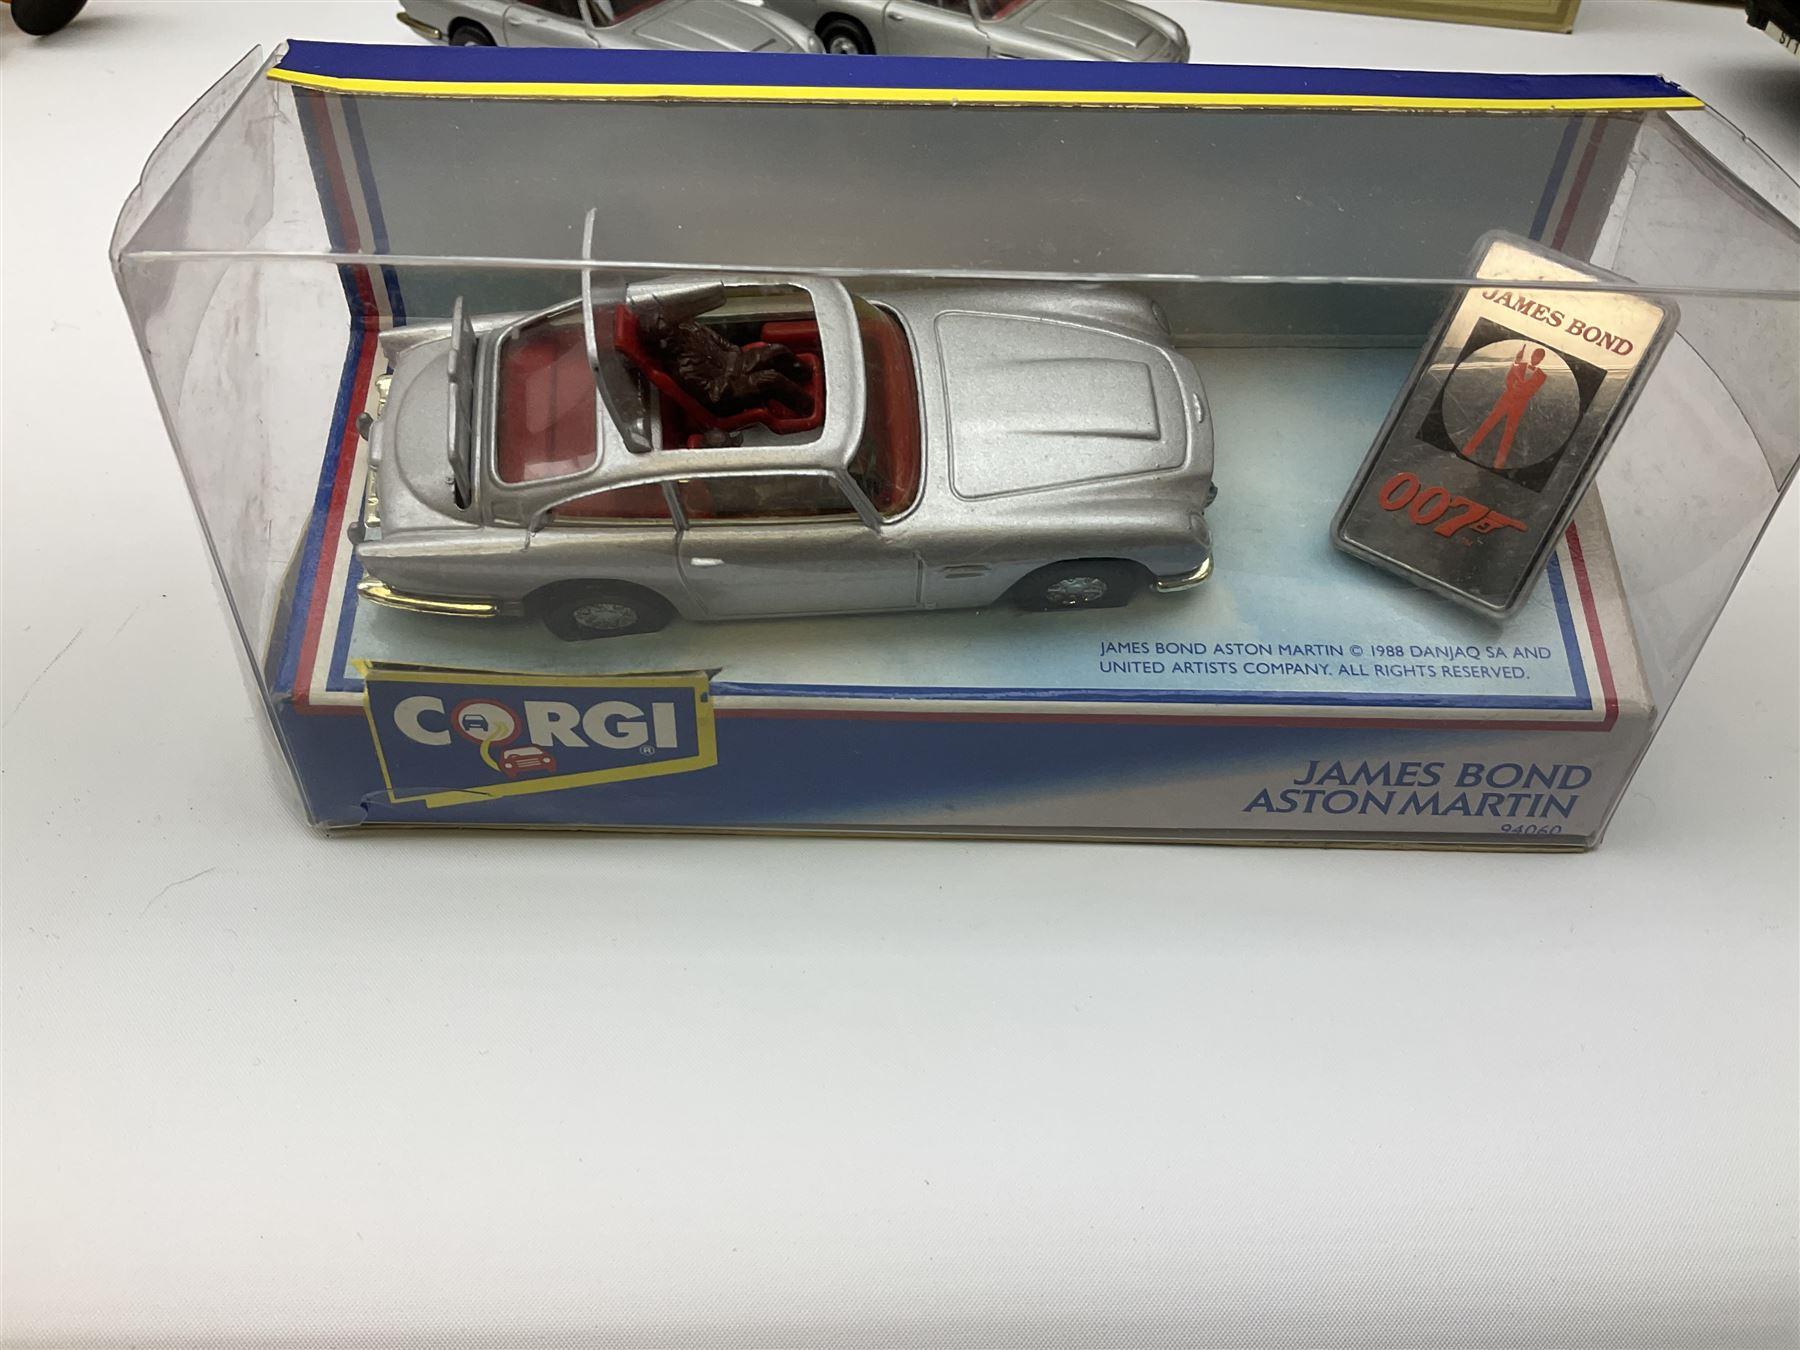 Corgi - 1991 James Bond Aston Martin No.94060 - Image 7 of 8